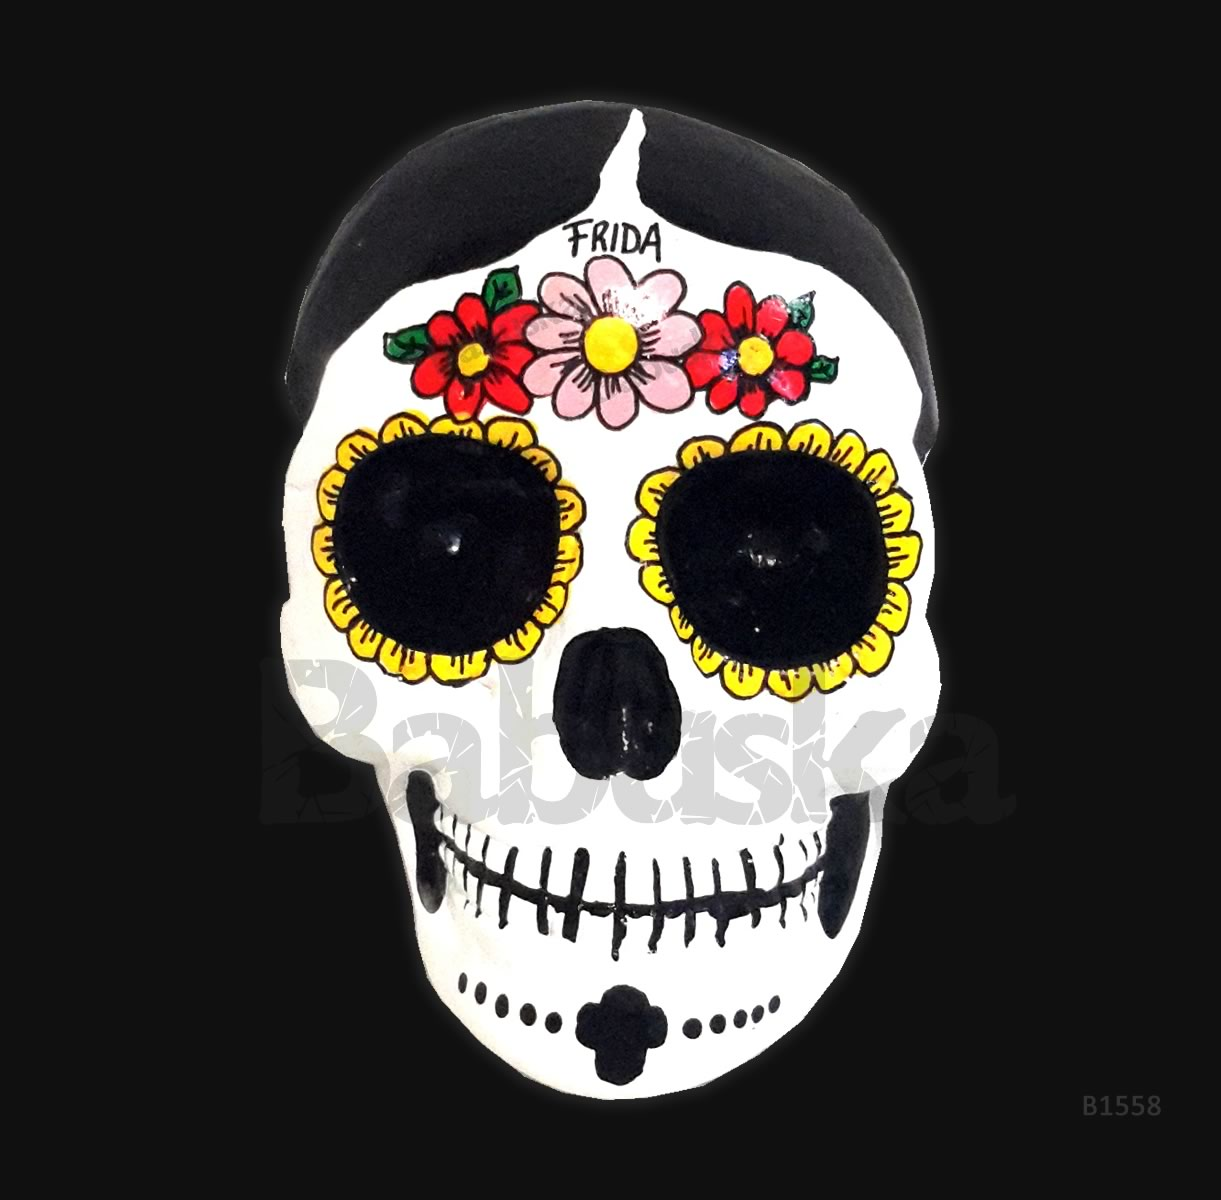 Frida Calavera mexicana - Babuska B1558